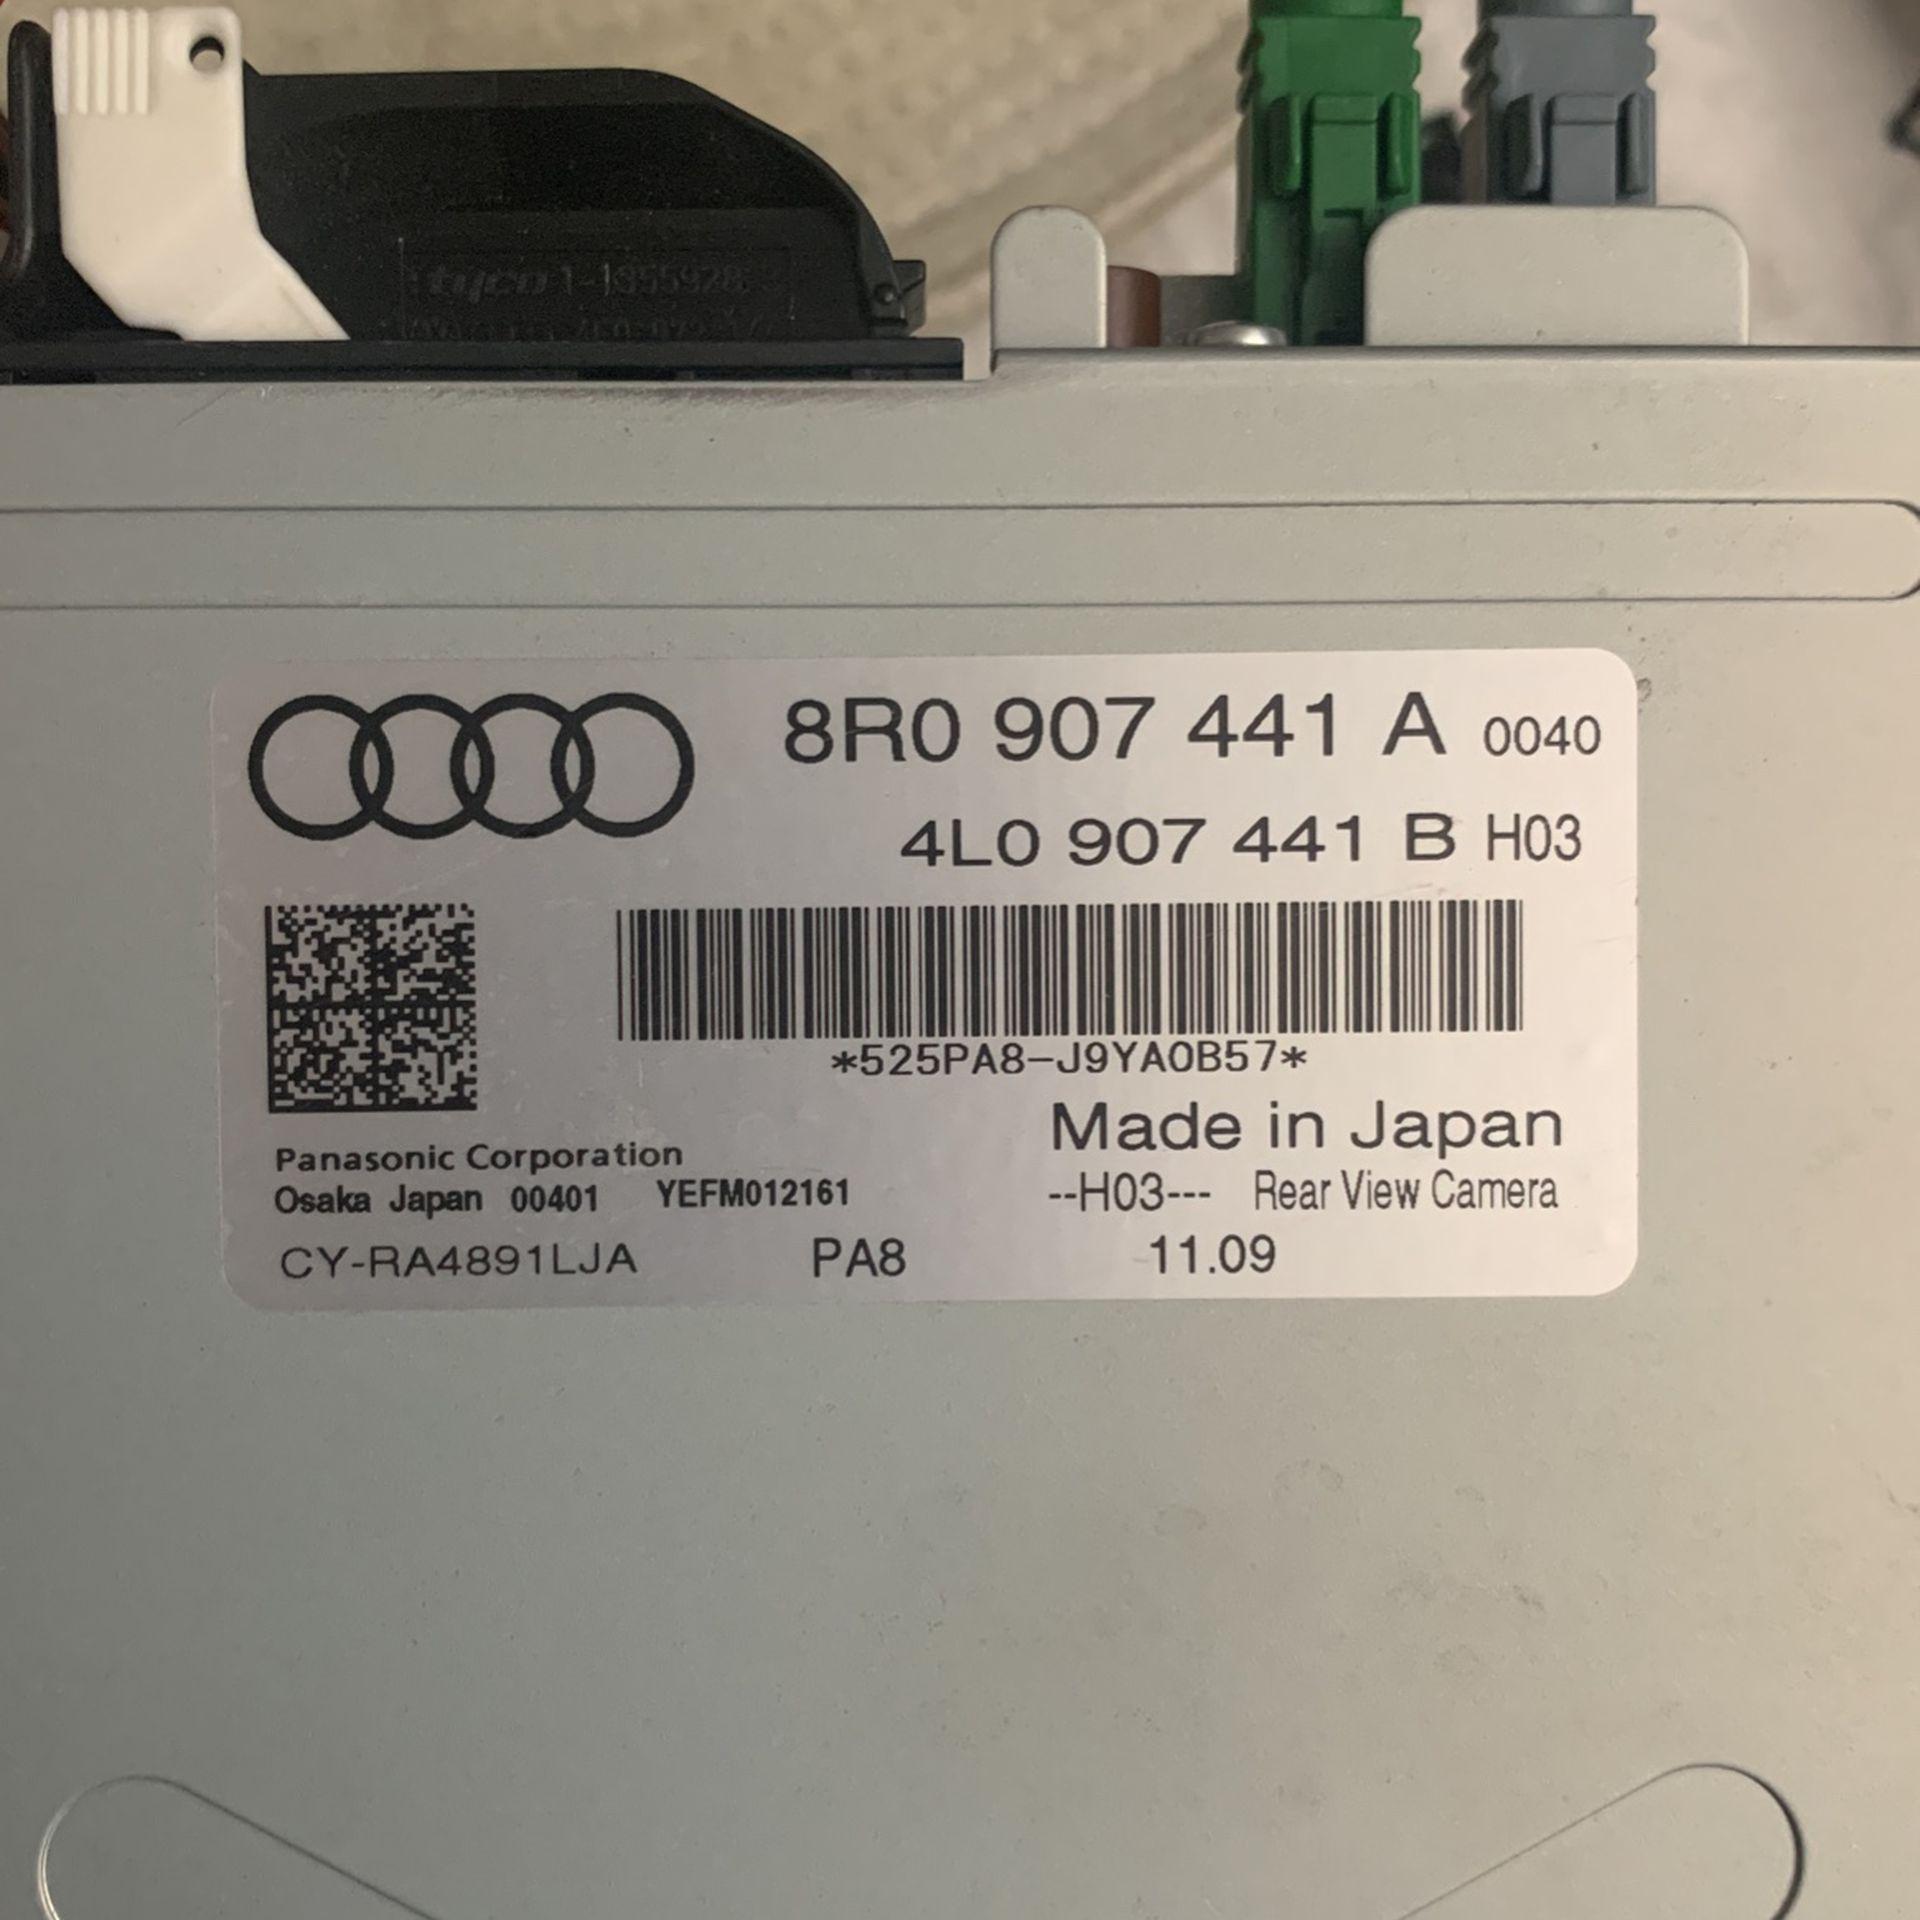 Audi Q5 Rear View Cámara And Monitor MMI